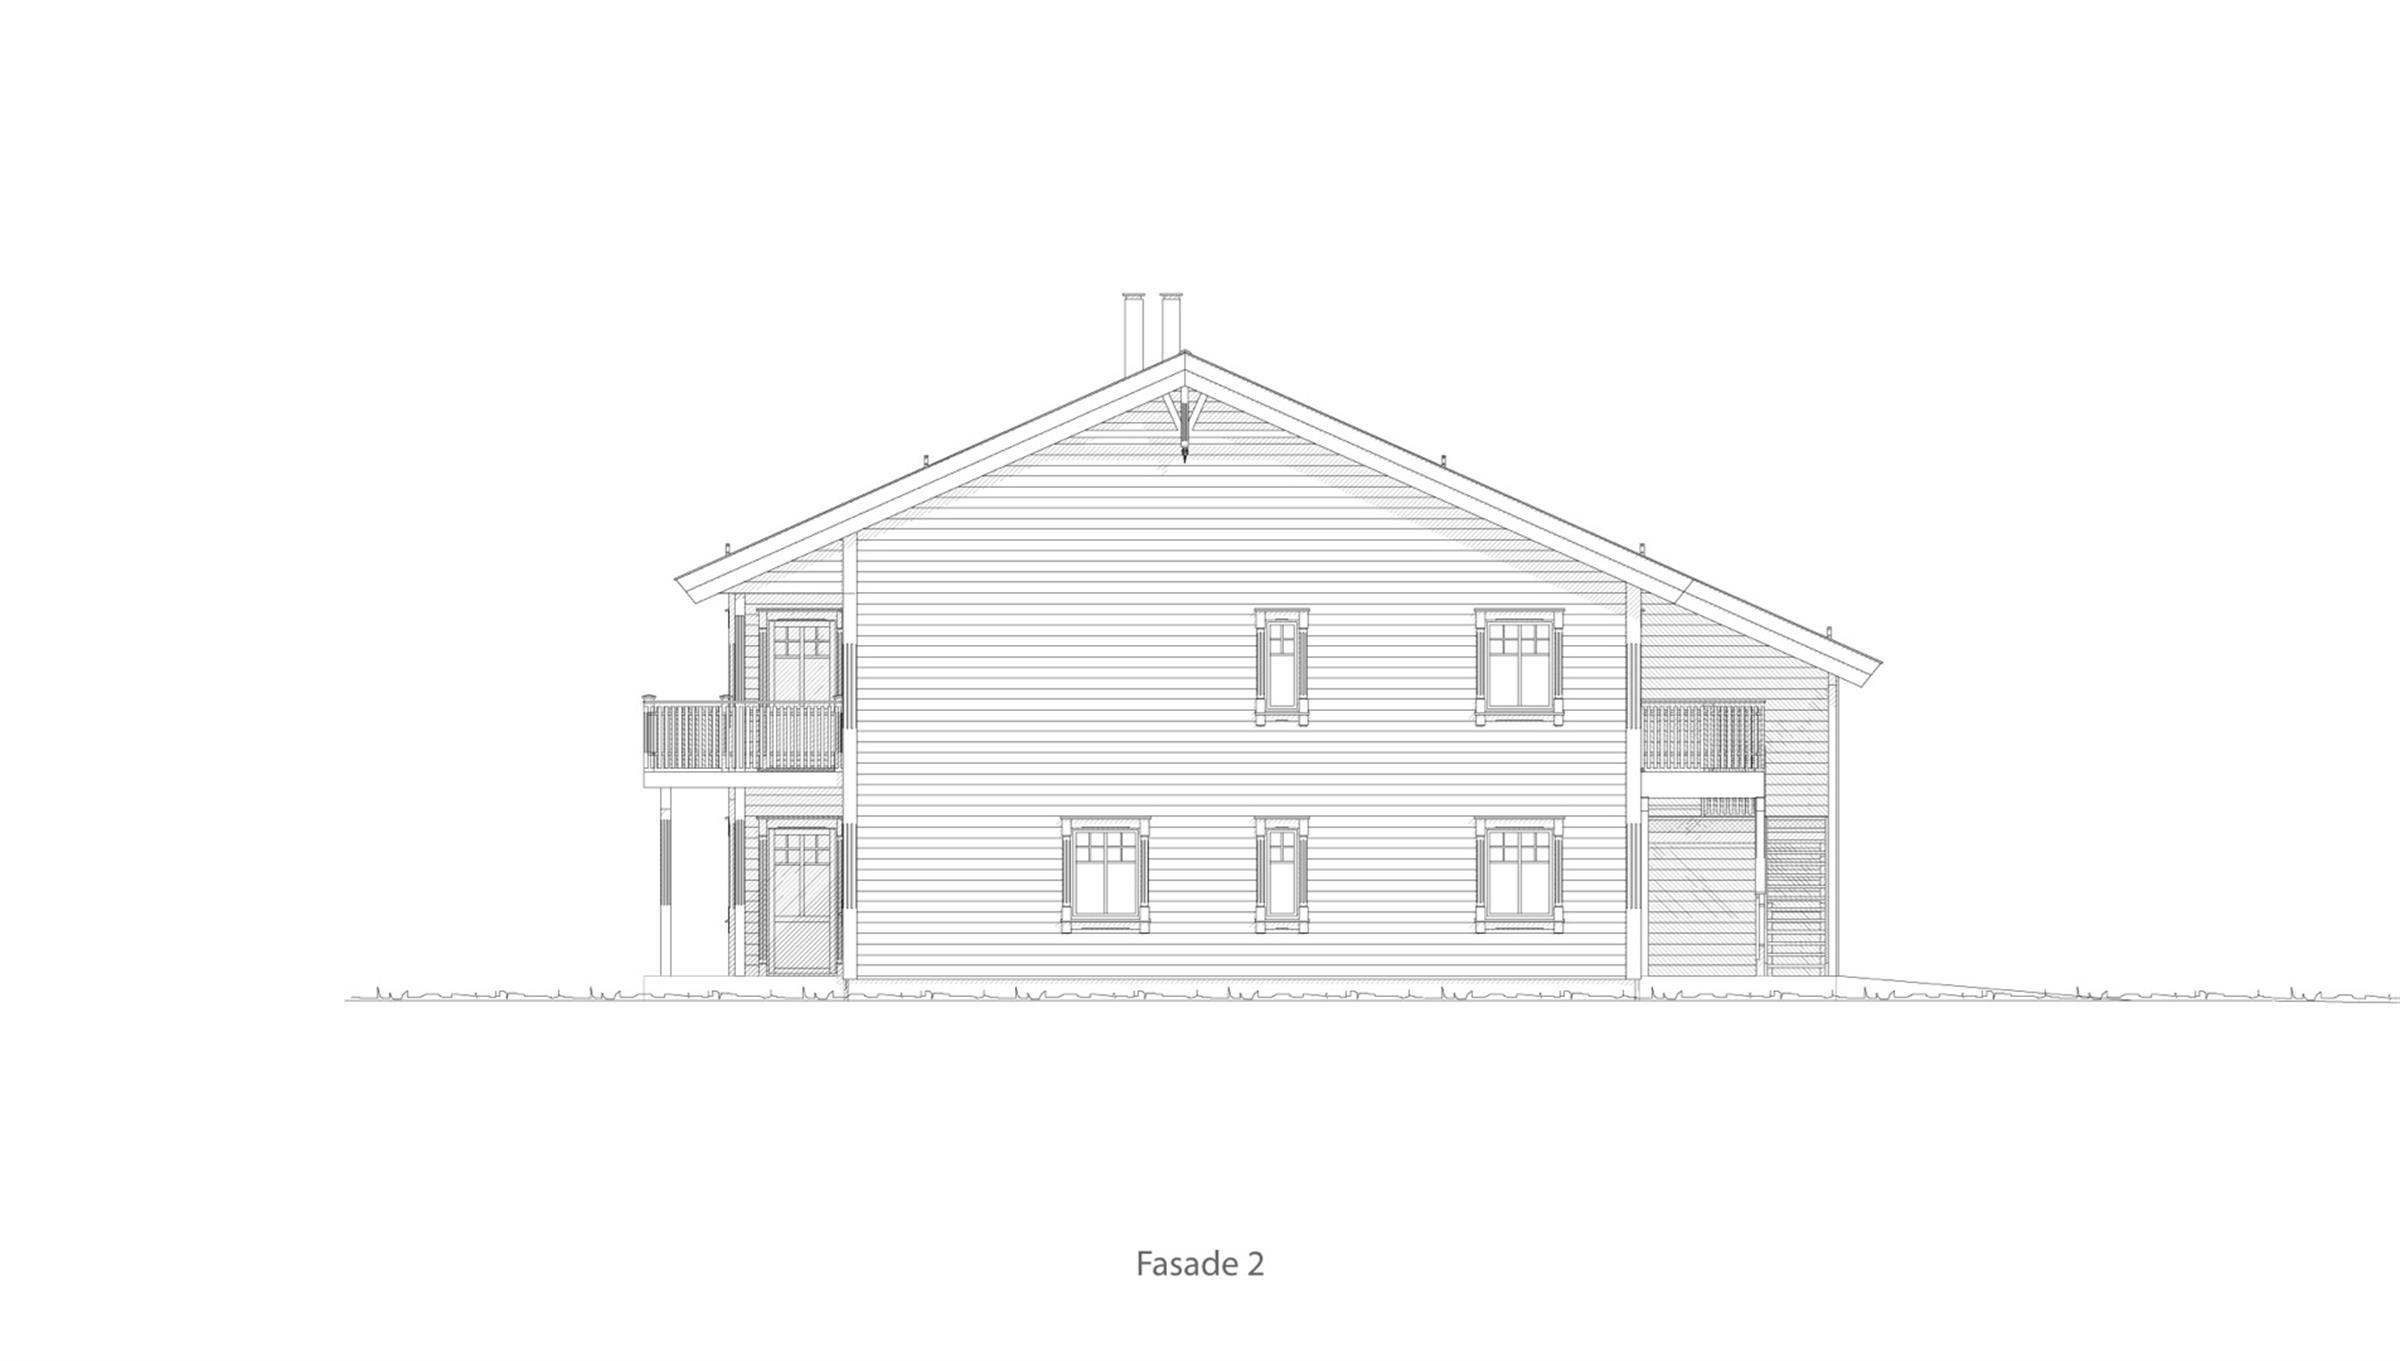 Fagernes fasade 2